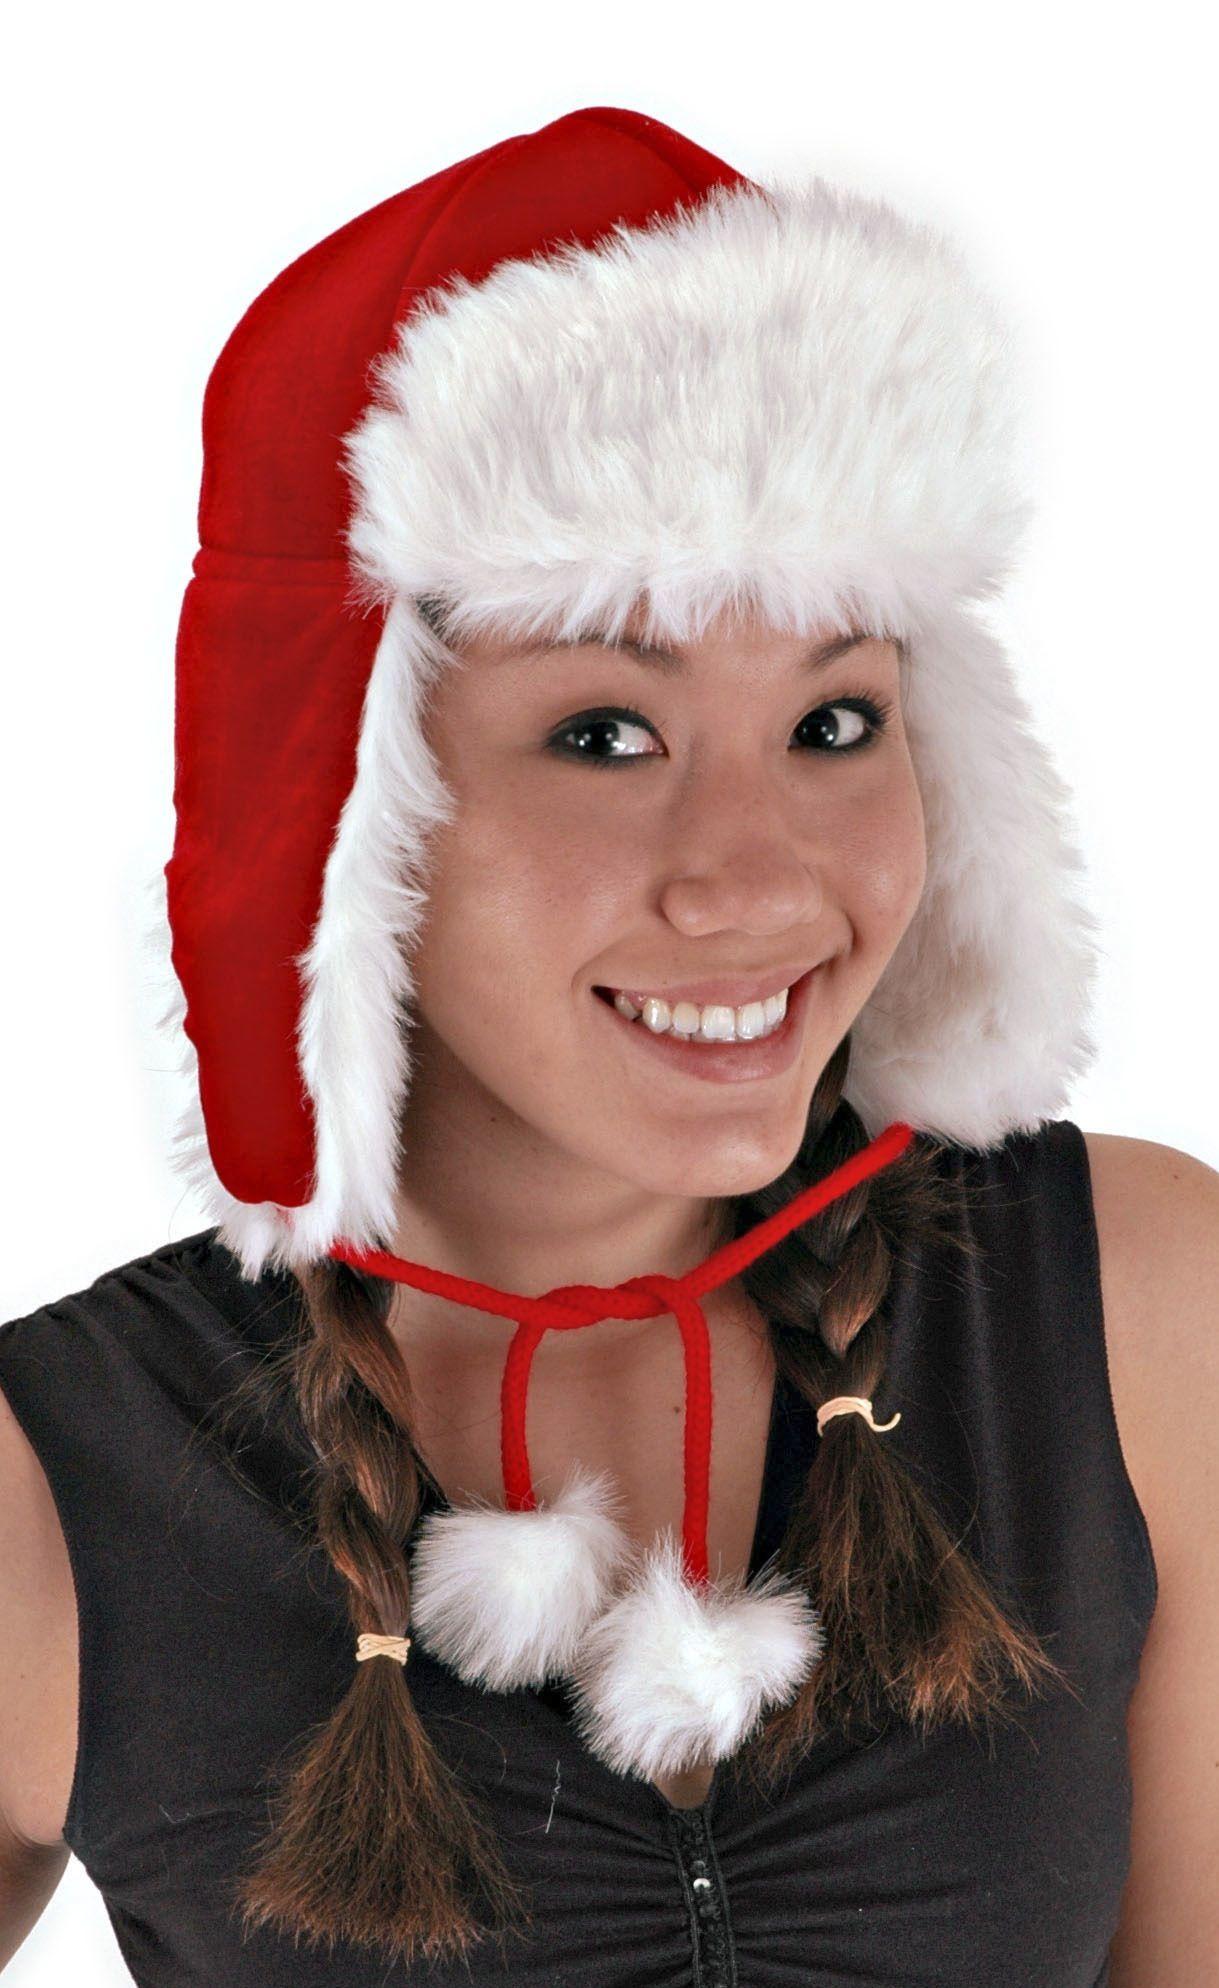 Red Santa Aviator Hat  Christmas  Pinterest  Aviator hat and Santa